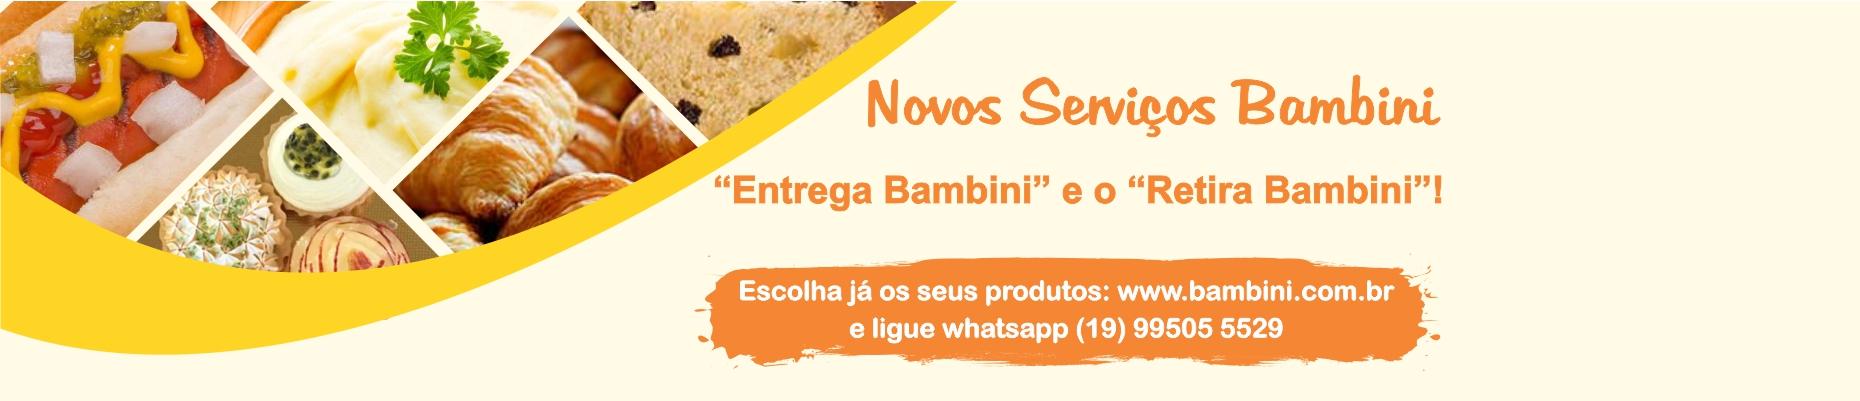 Anúncio Serviços Bambini_Slider_1854x400px